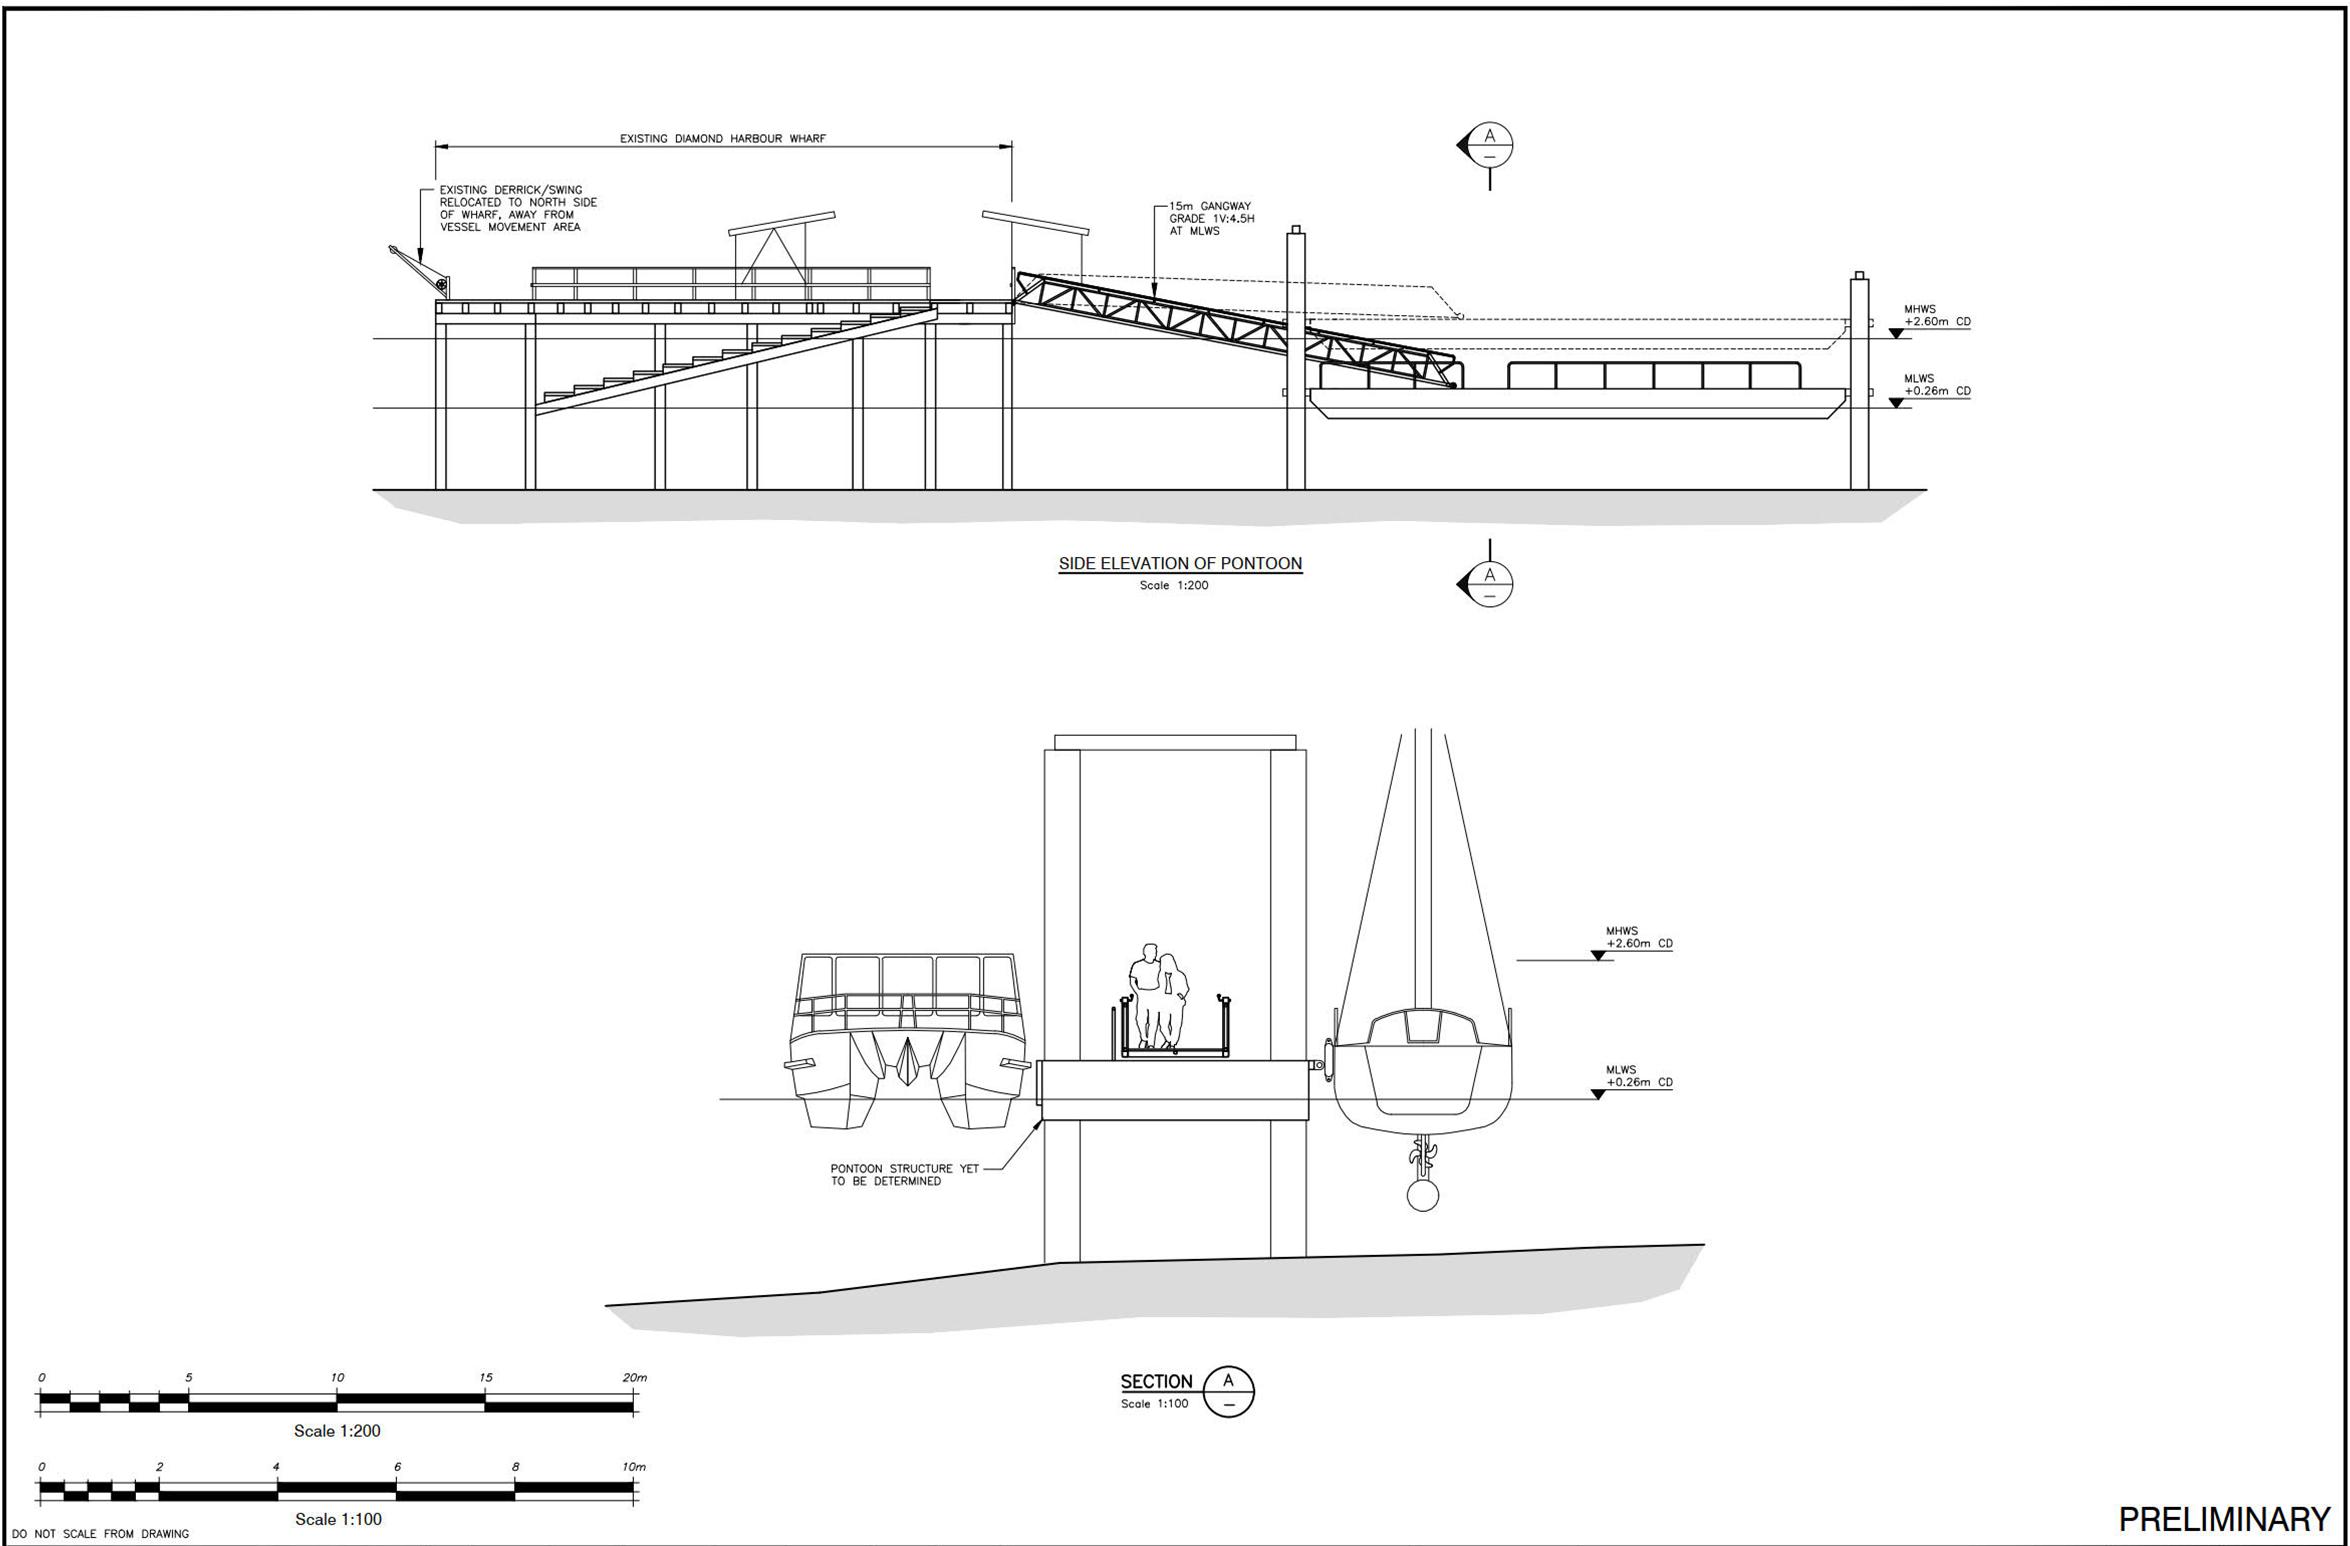 Diamond Harbour Wharf cross section of the new pontoon